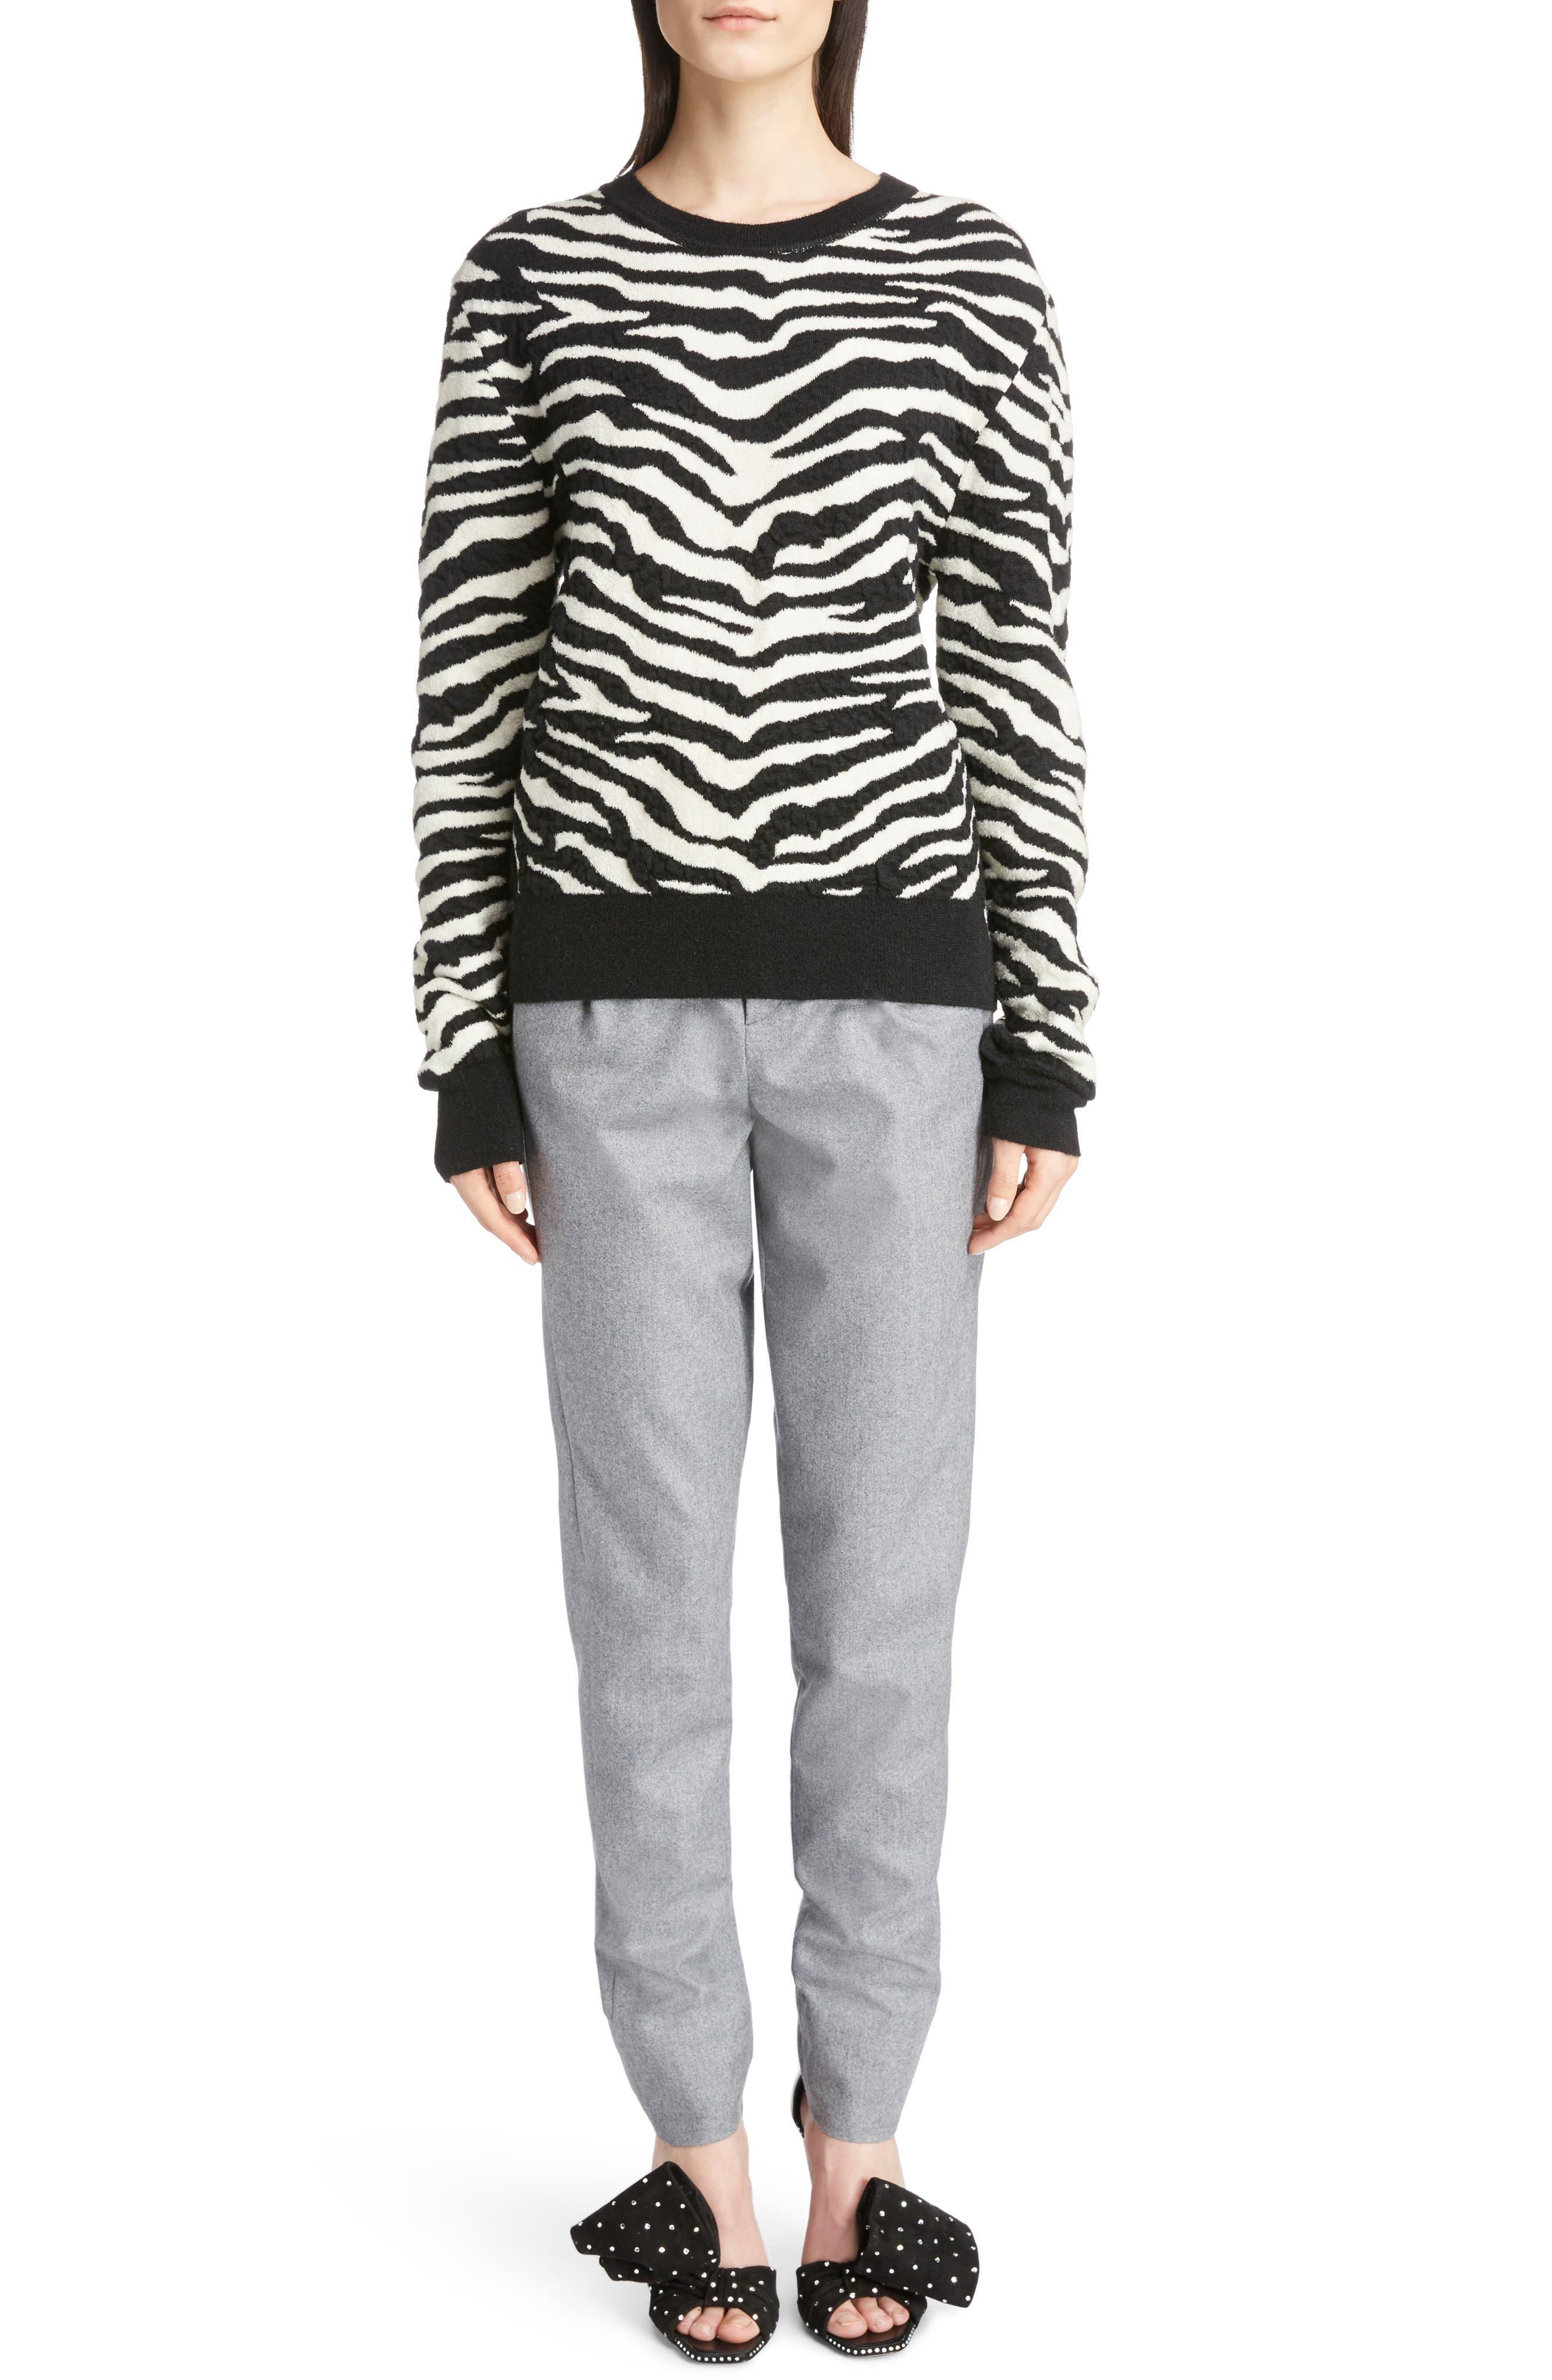 Alternate Image 1 Selected - Saint Laurent Tiger Knit Sweater